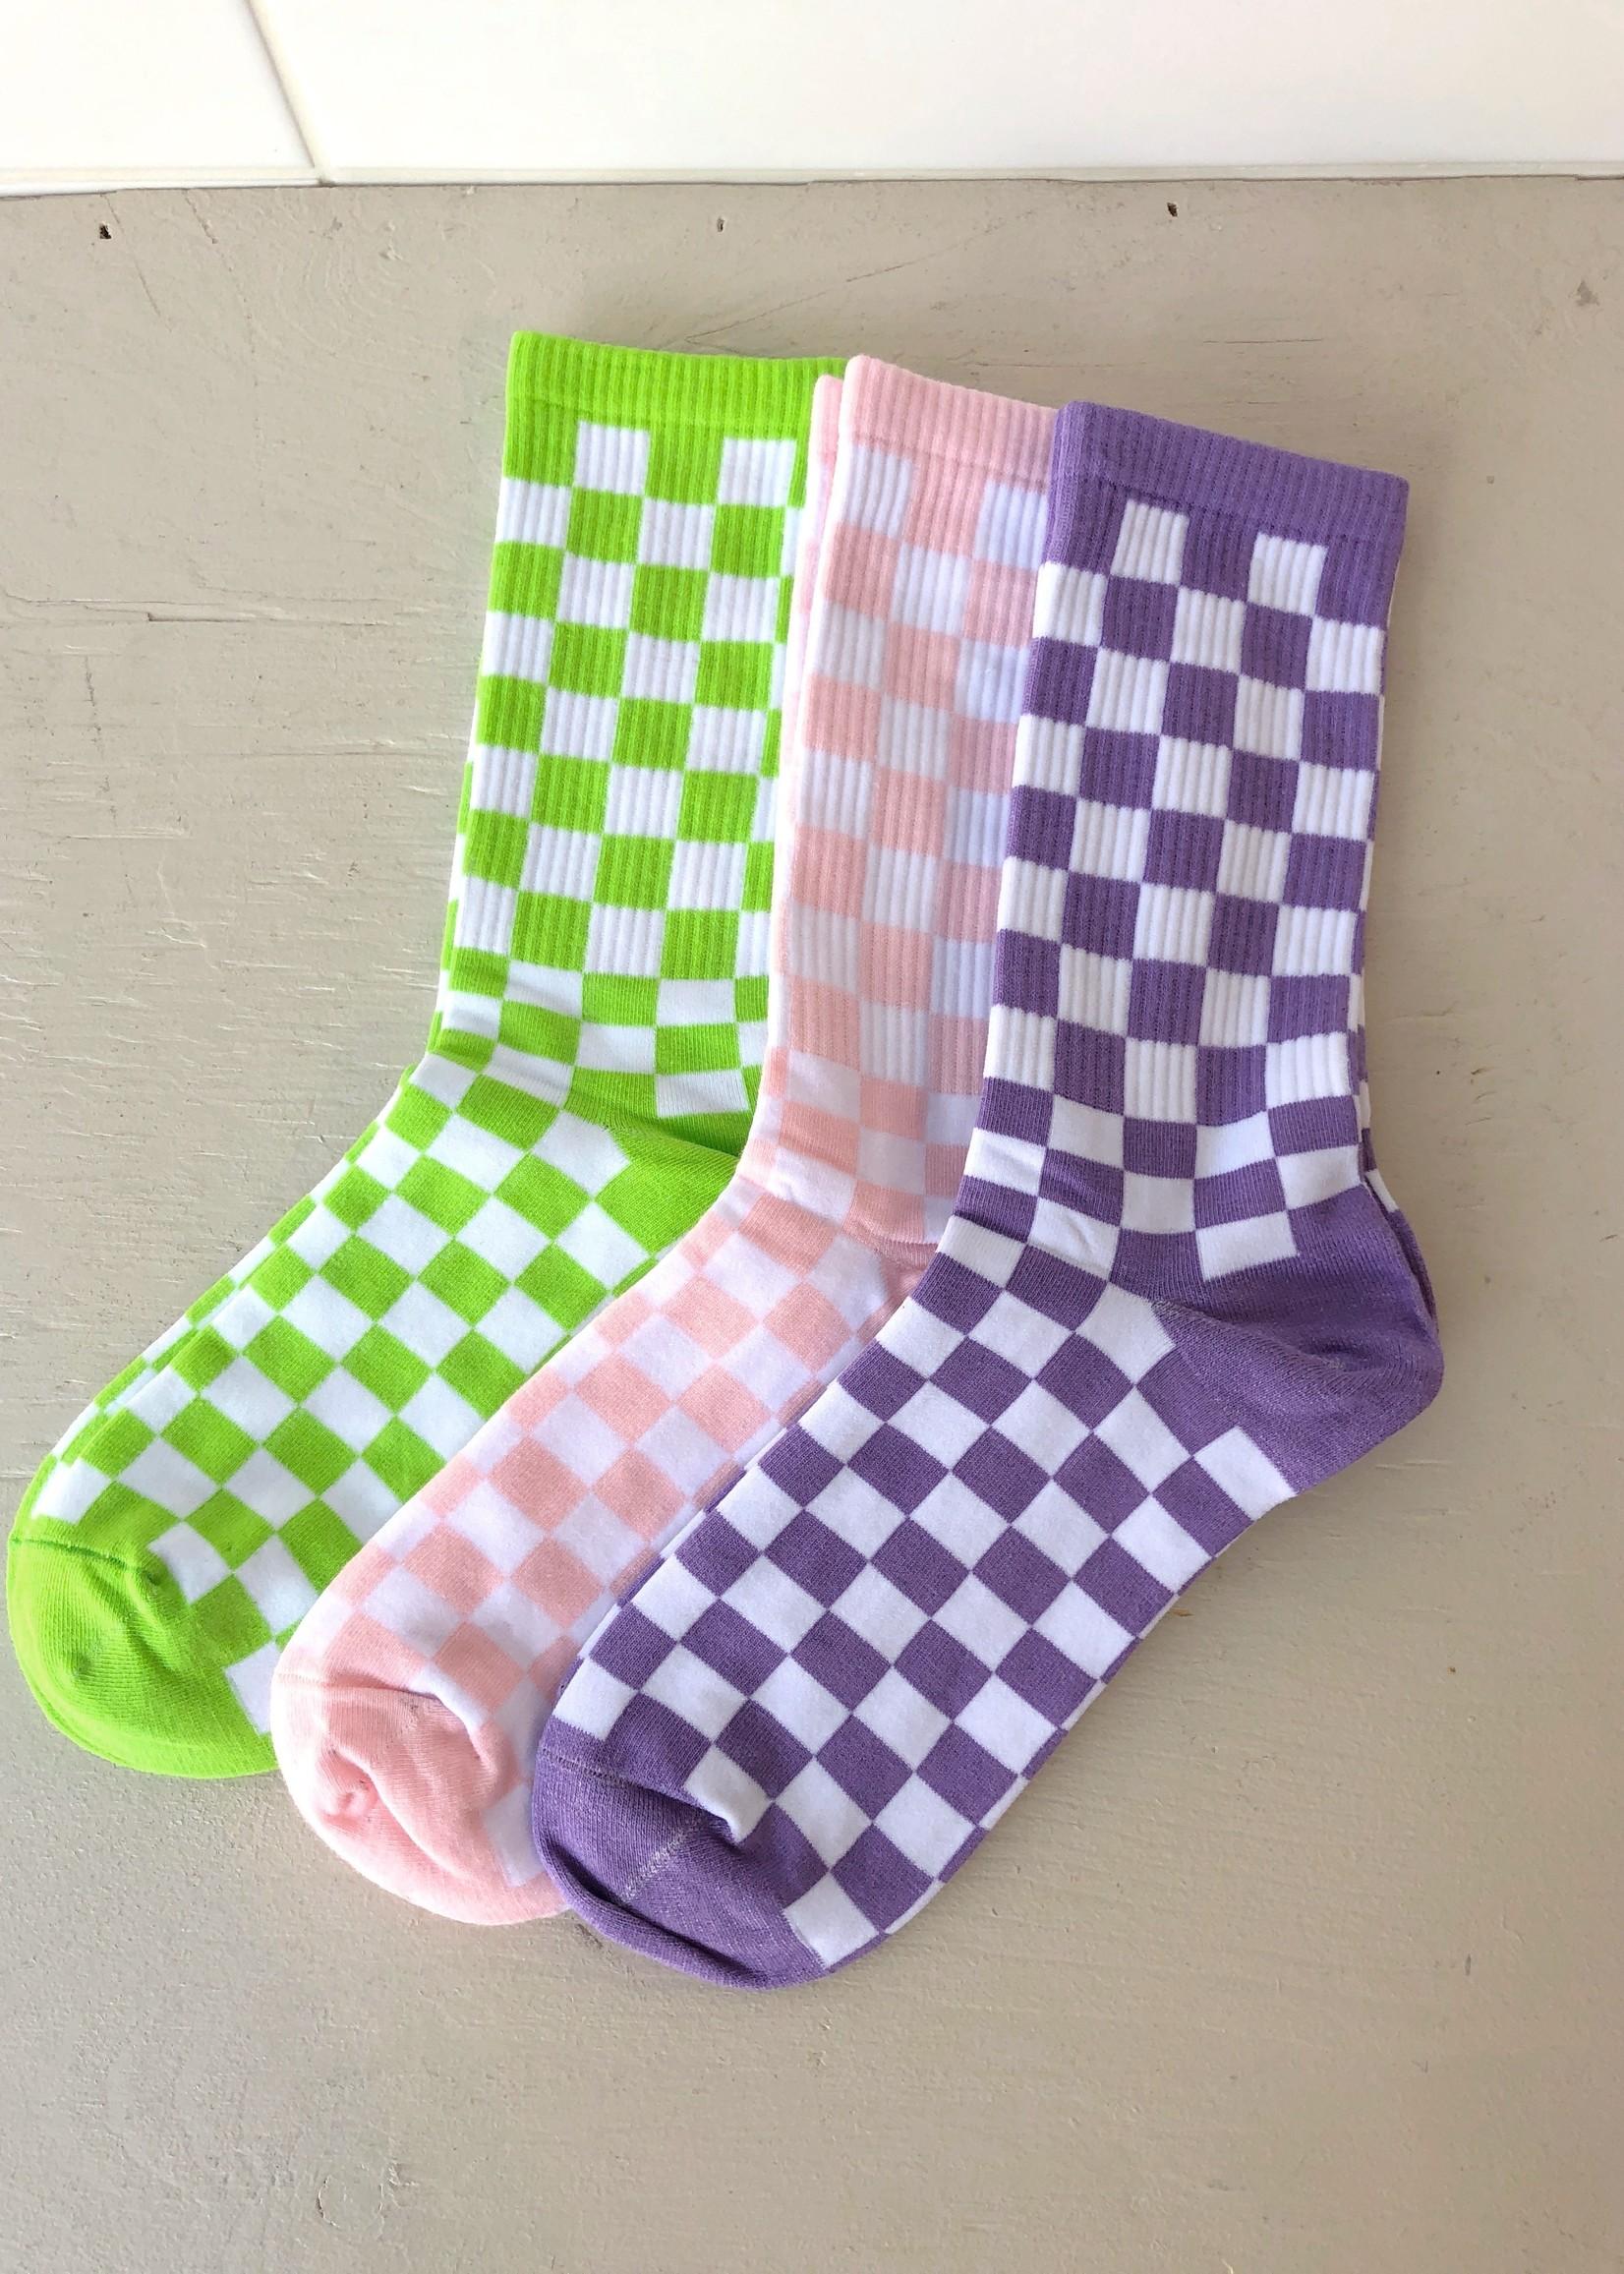 Annex Vintage Ribbed Checkerboard Socks by Annex Vintage